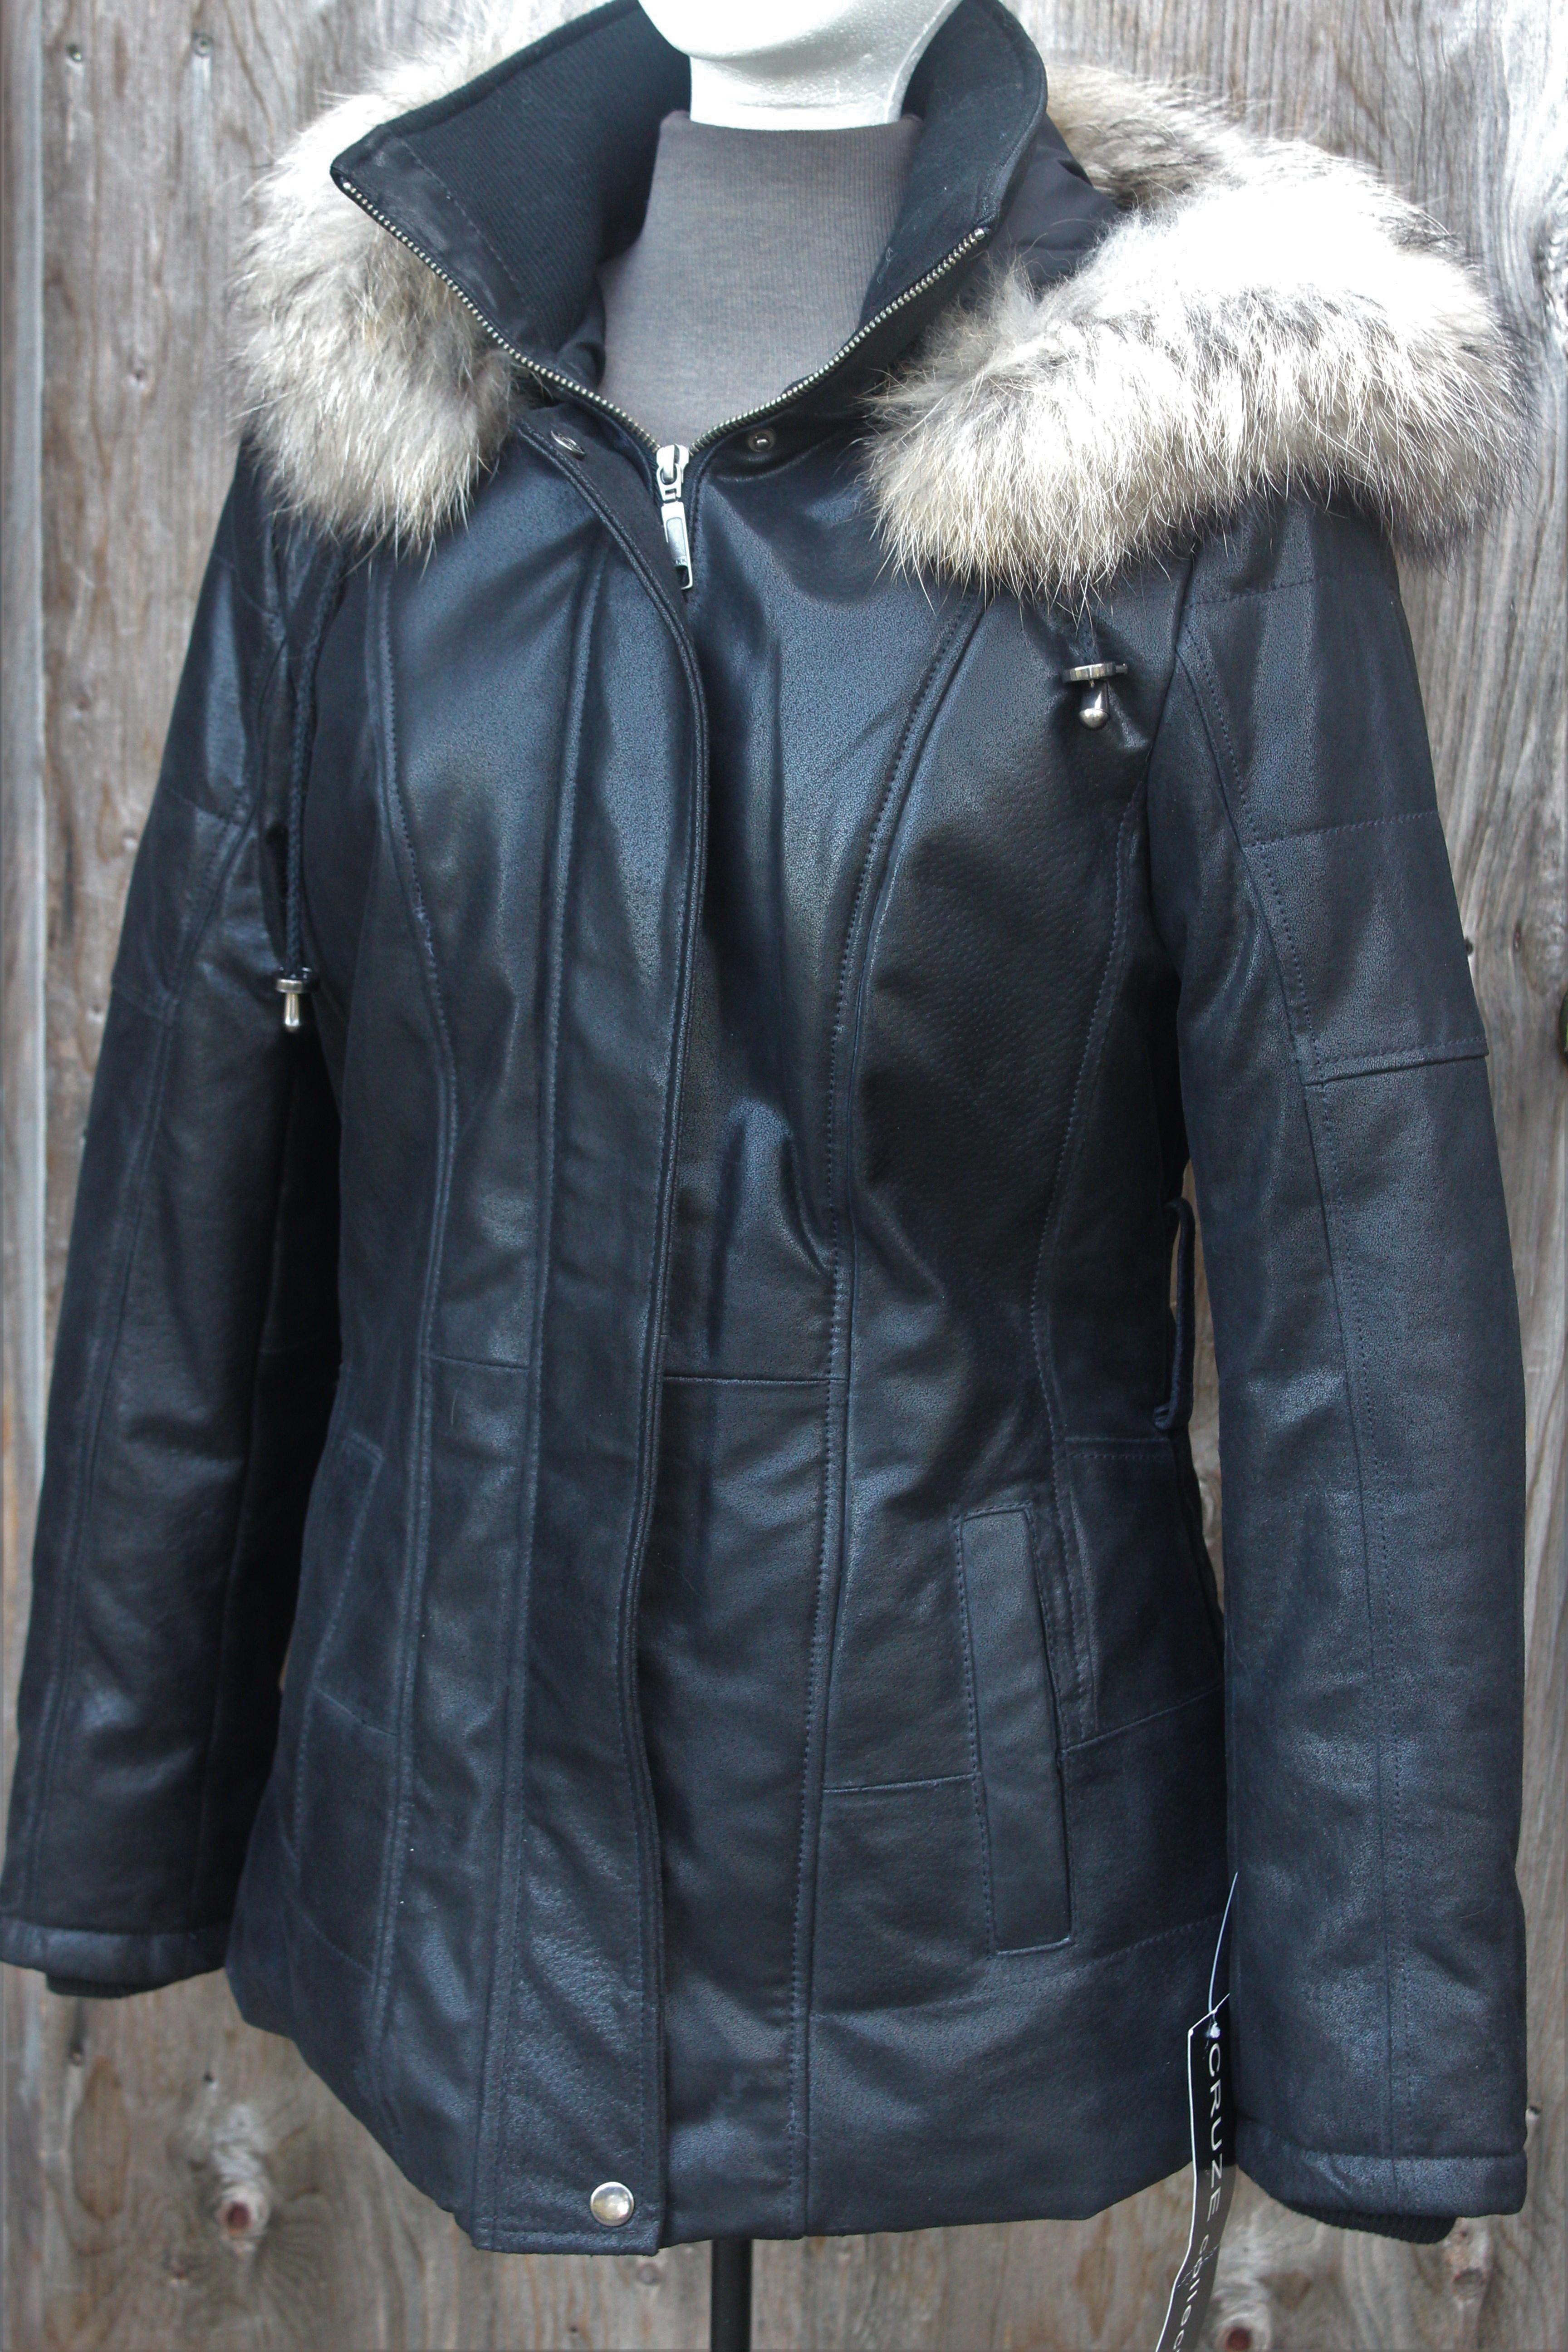 Black- $375.00 Cruze: Style #37615BKS